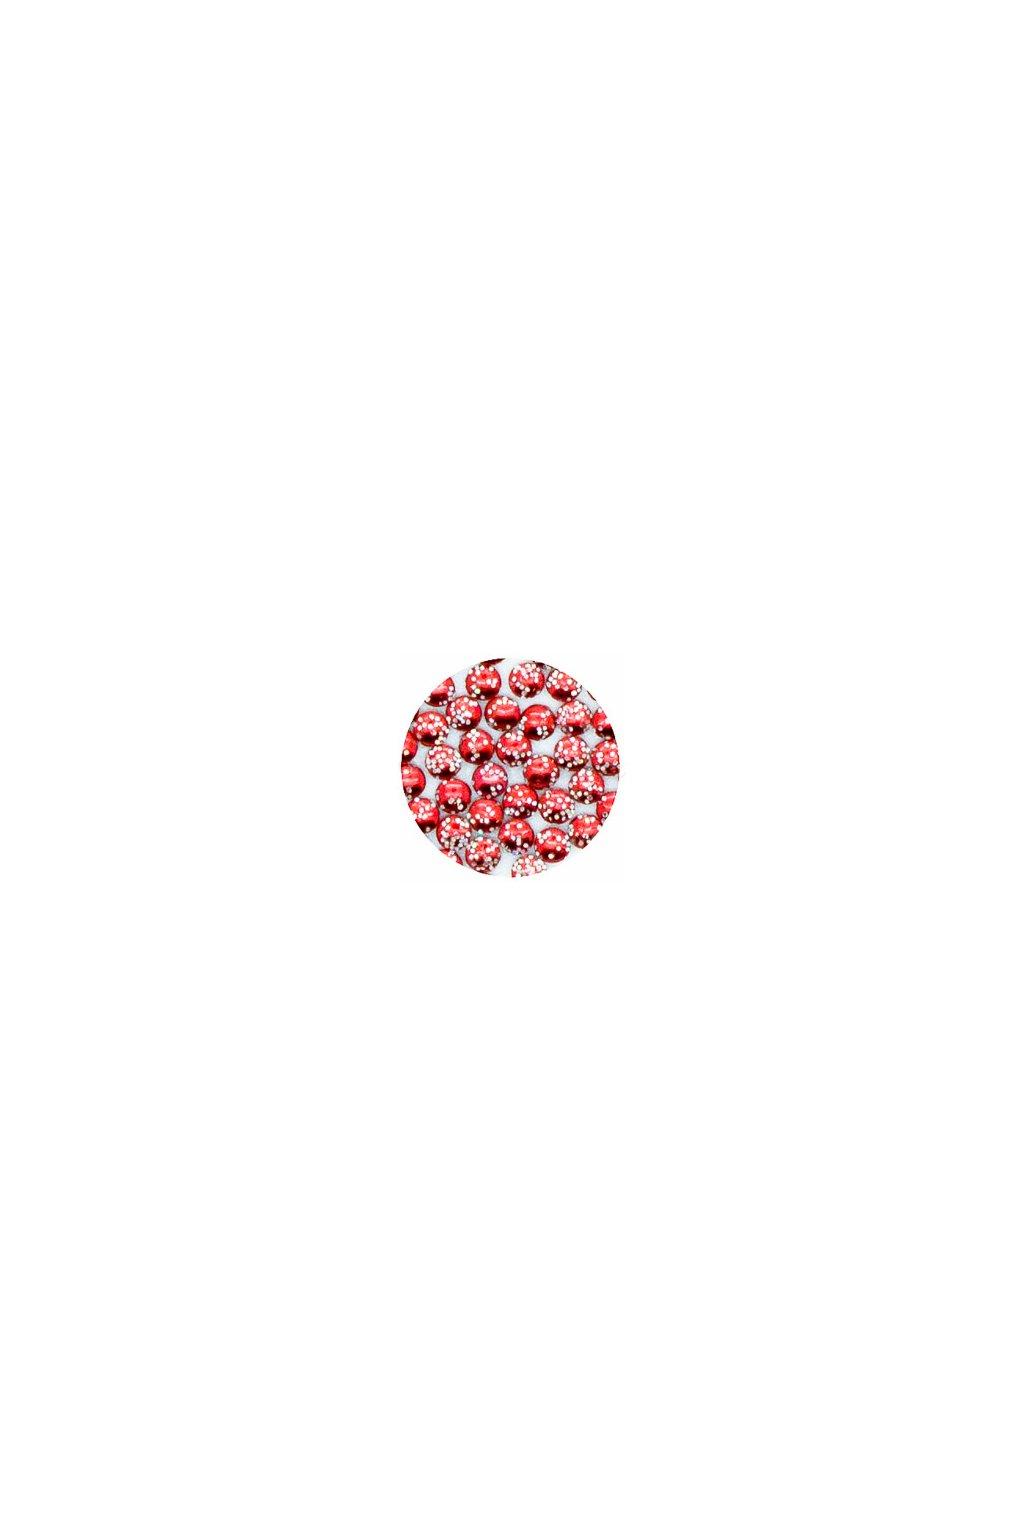 23318 lentilky trpytive cervene